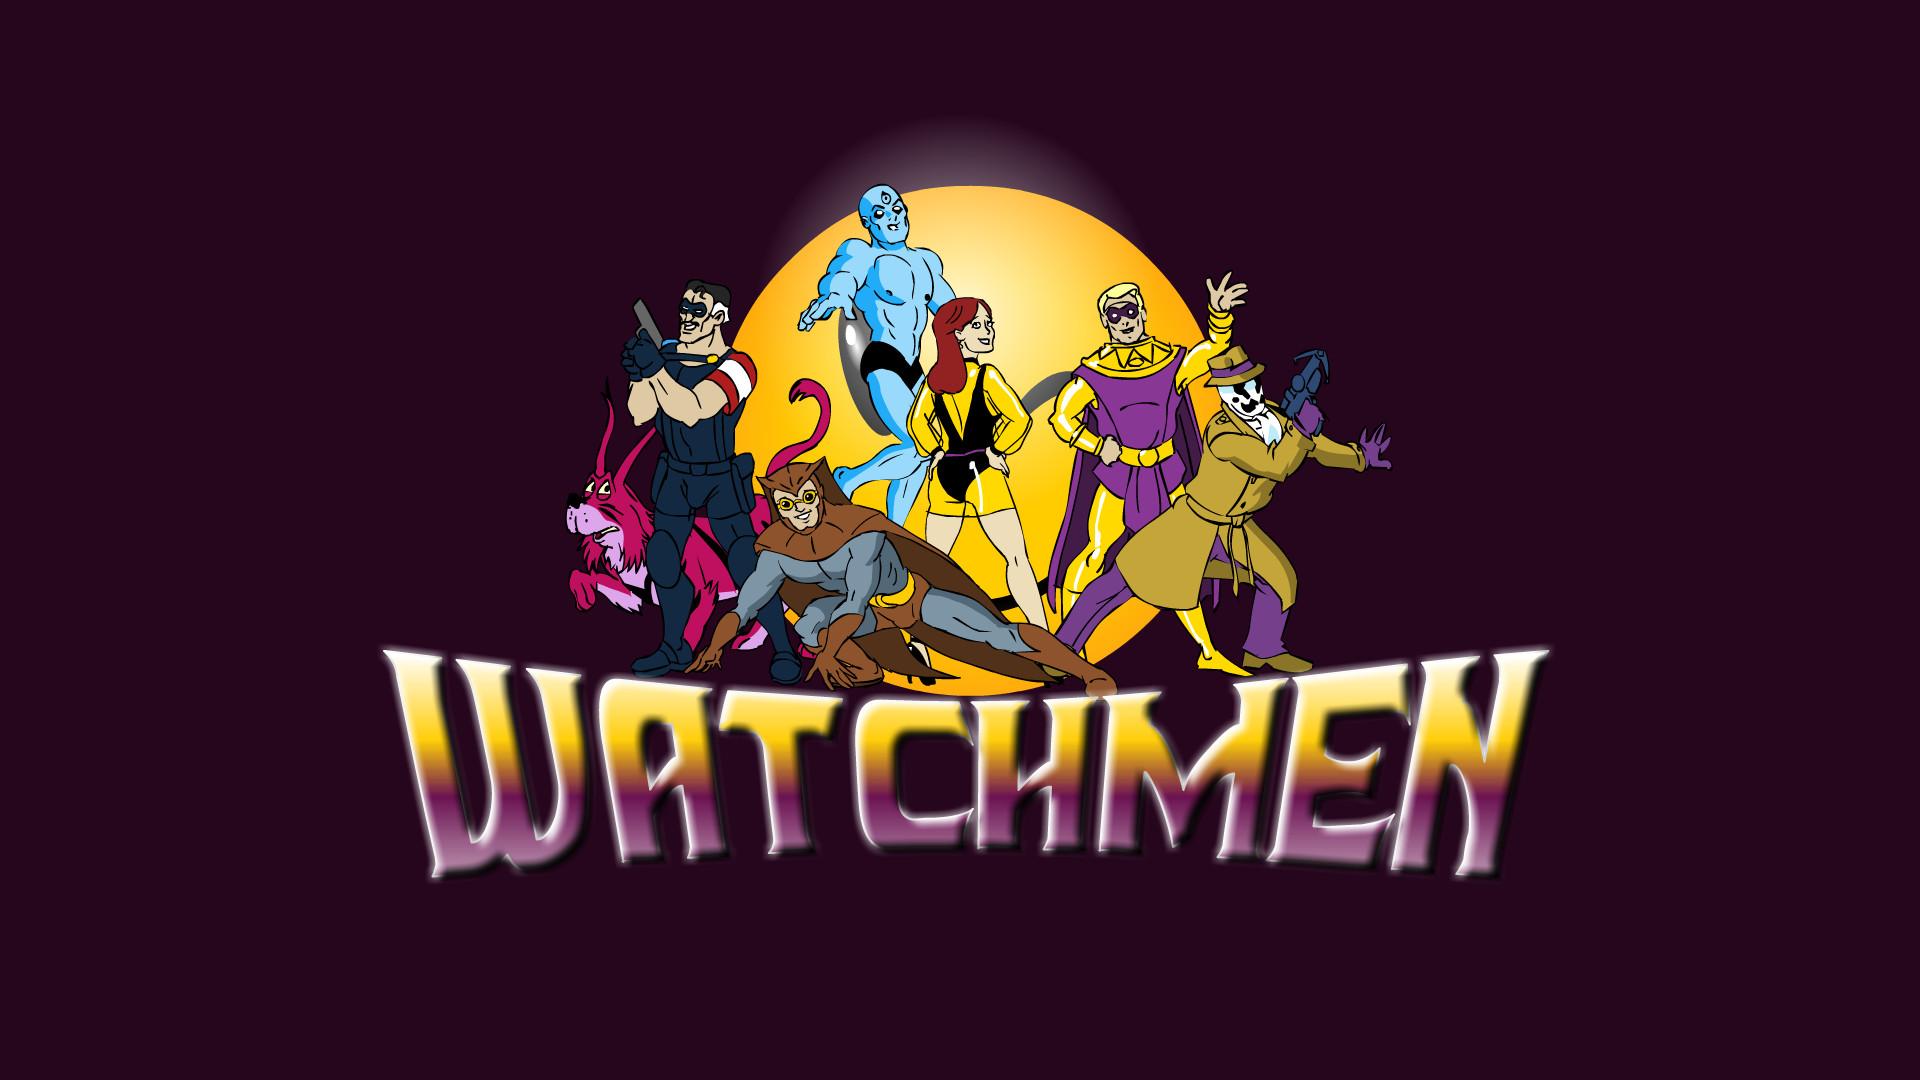 Dr. Manhattan, Watchmen, DC Comics Wallpapers HD / Desktop and .